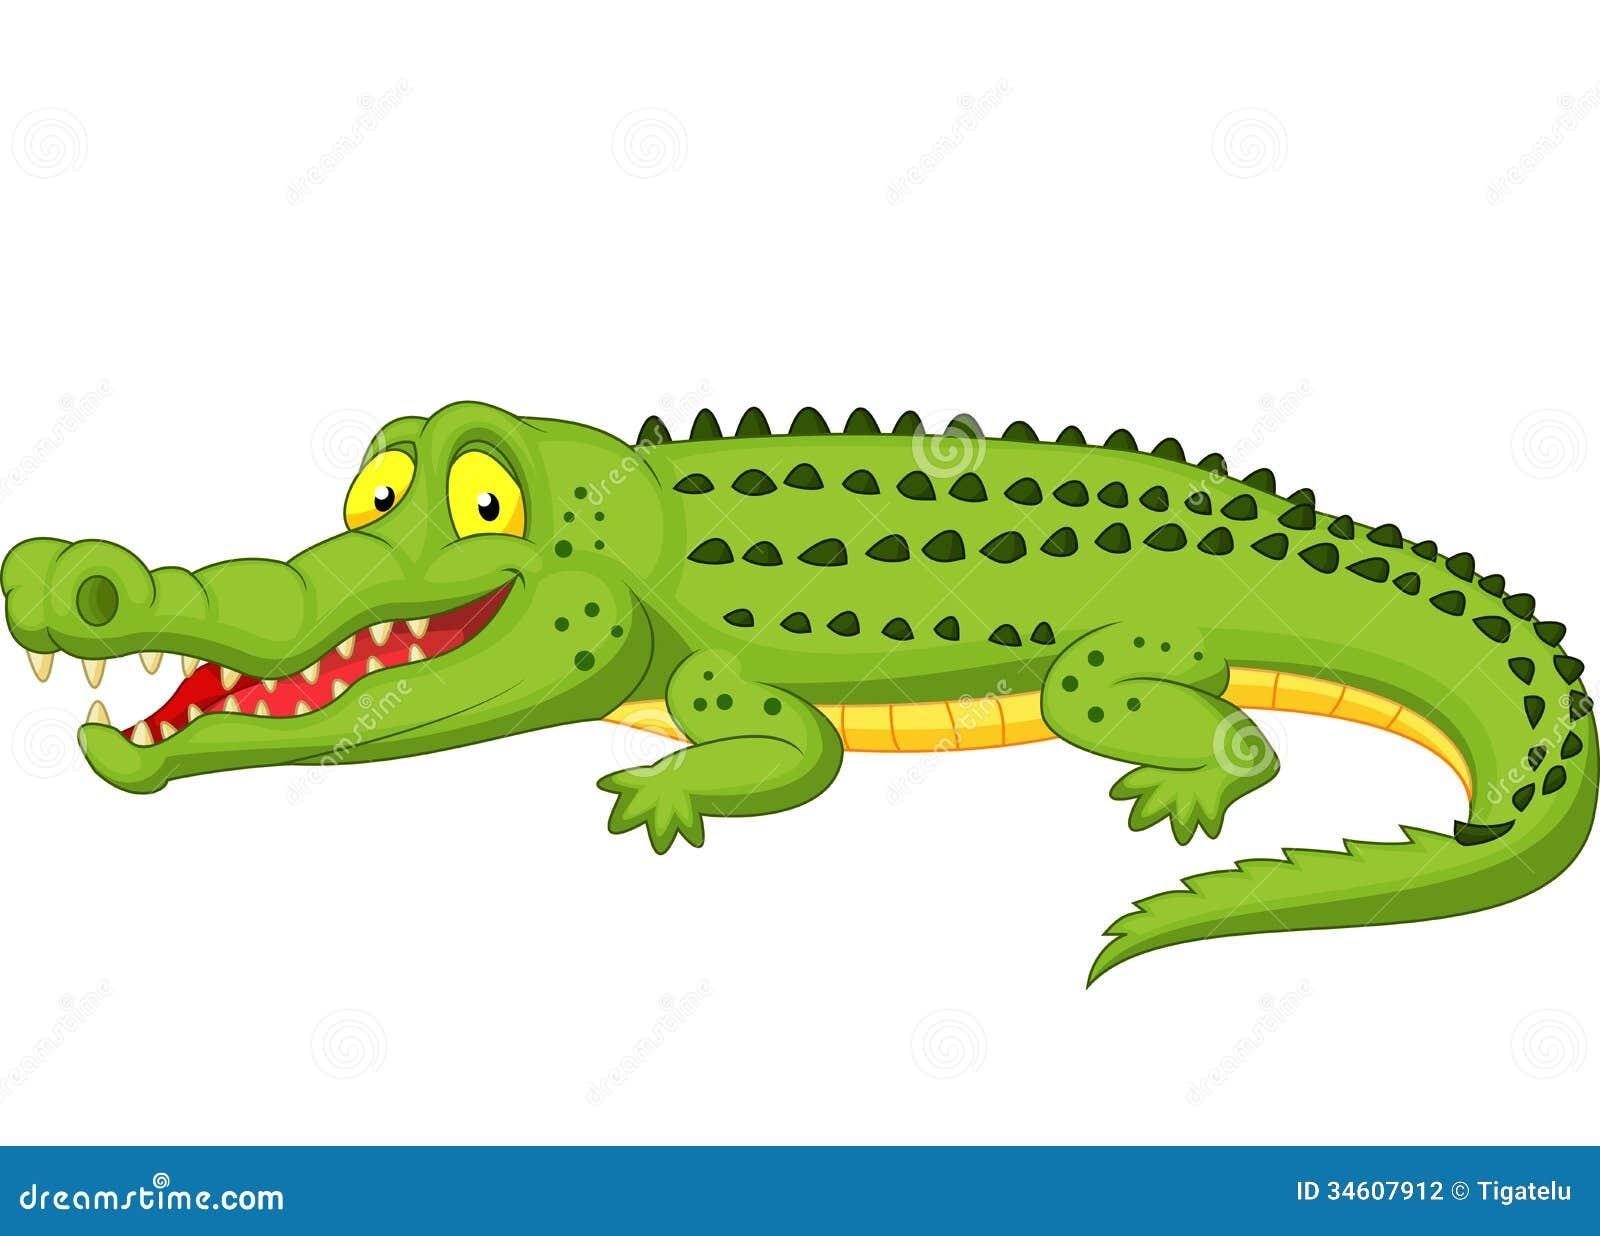 Bande dessin e de crocodile illustration de vecteur illustration du nature amical 34607912 - Dessin anime de crocodile ...